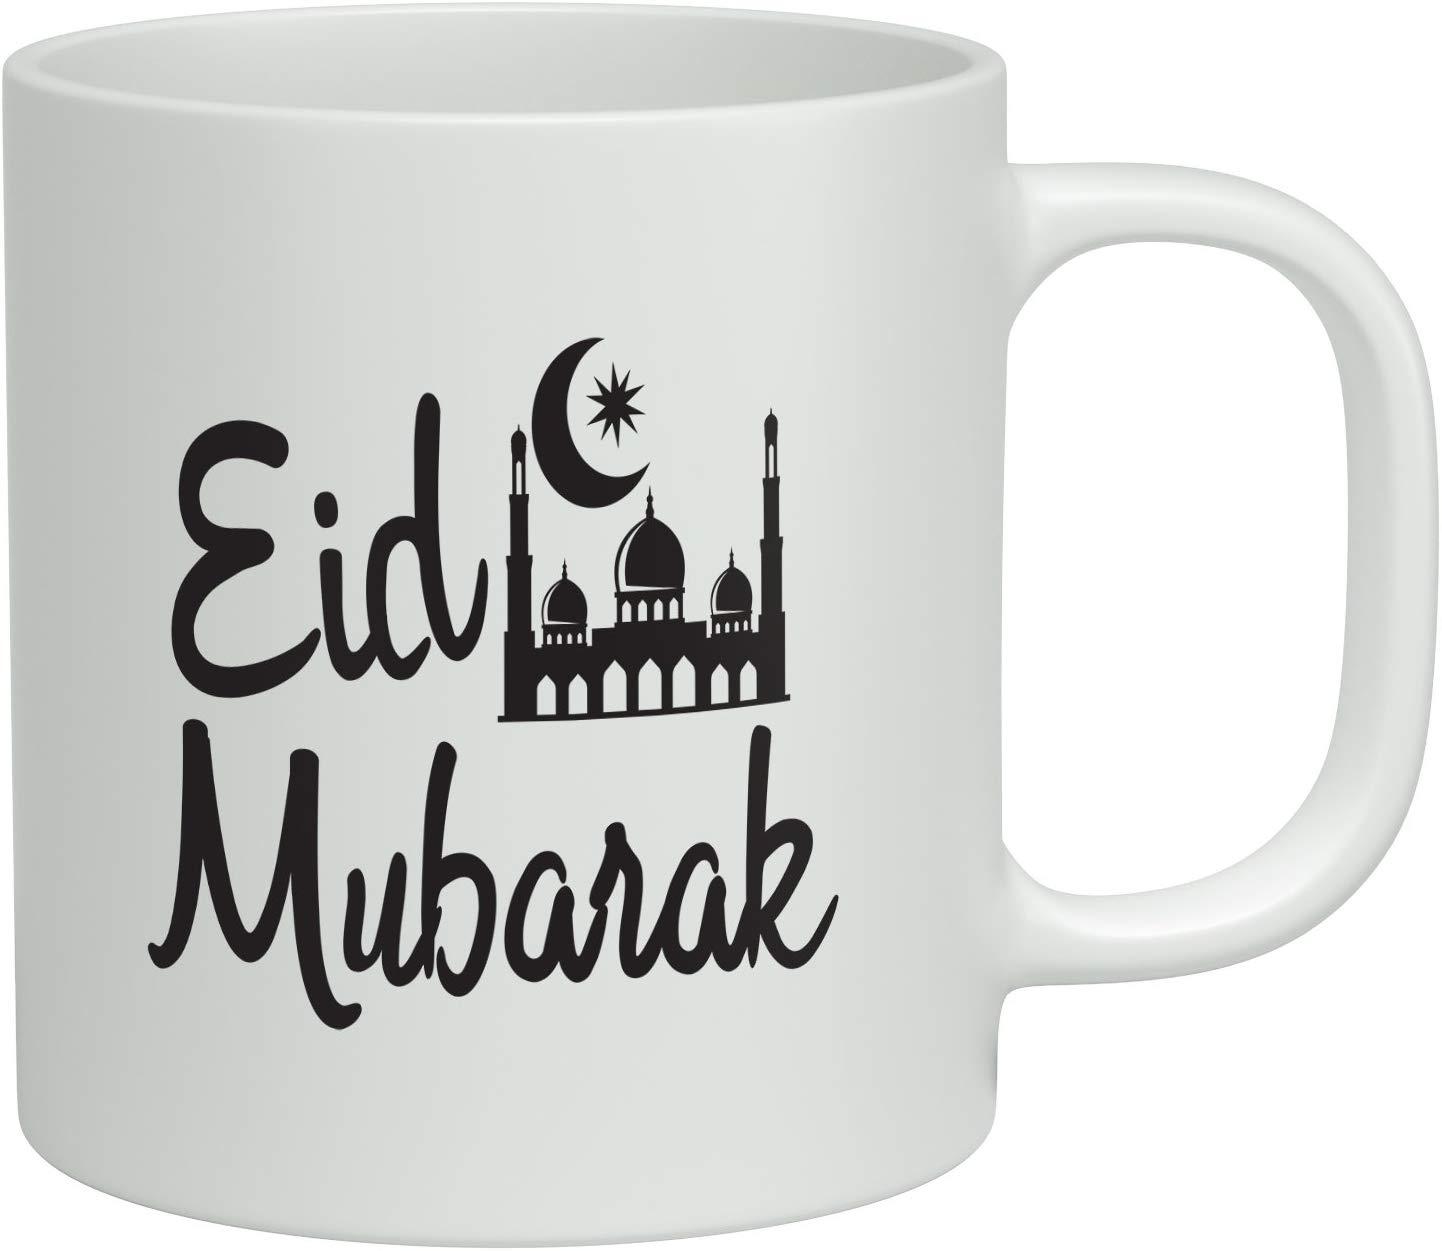 Novelty Gift Mug Cup